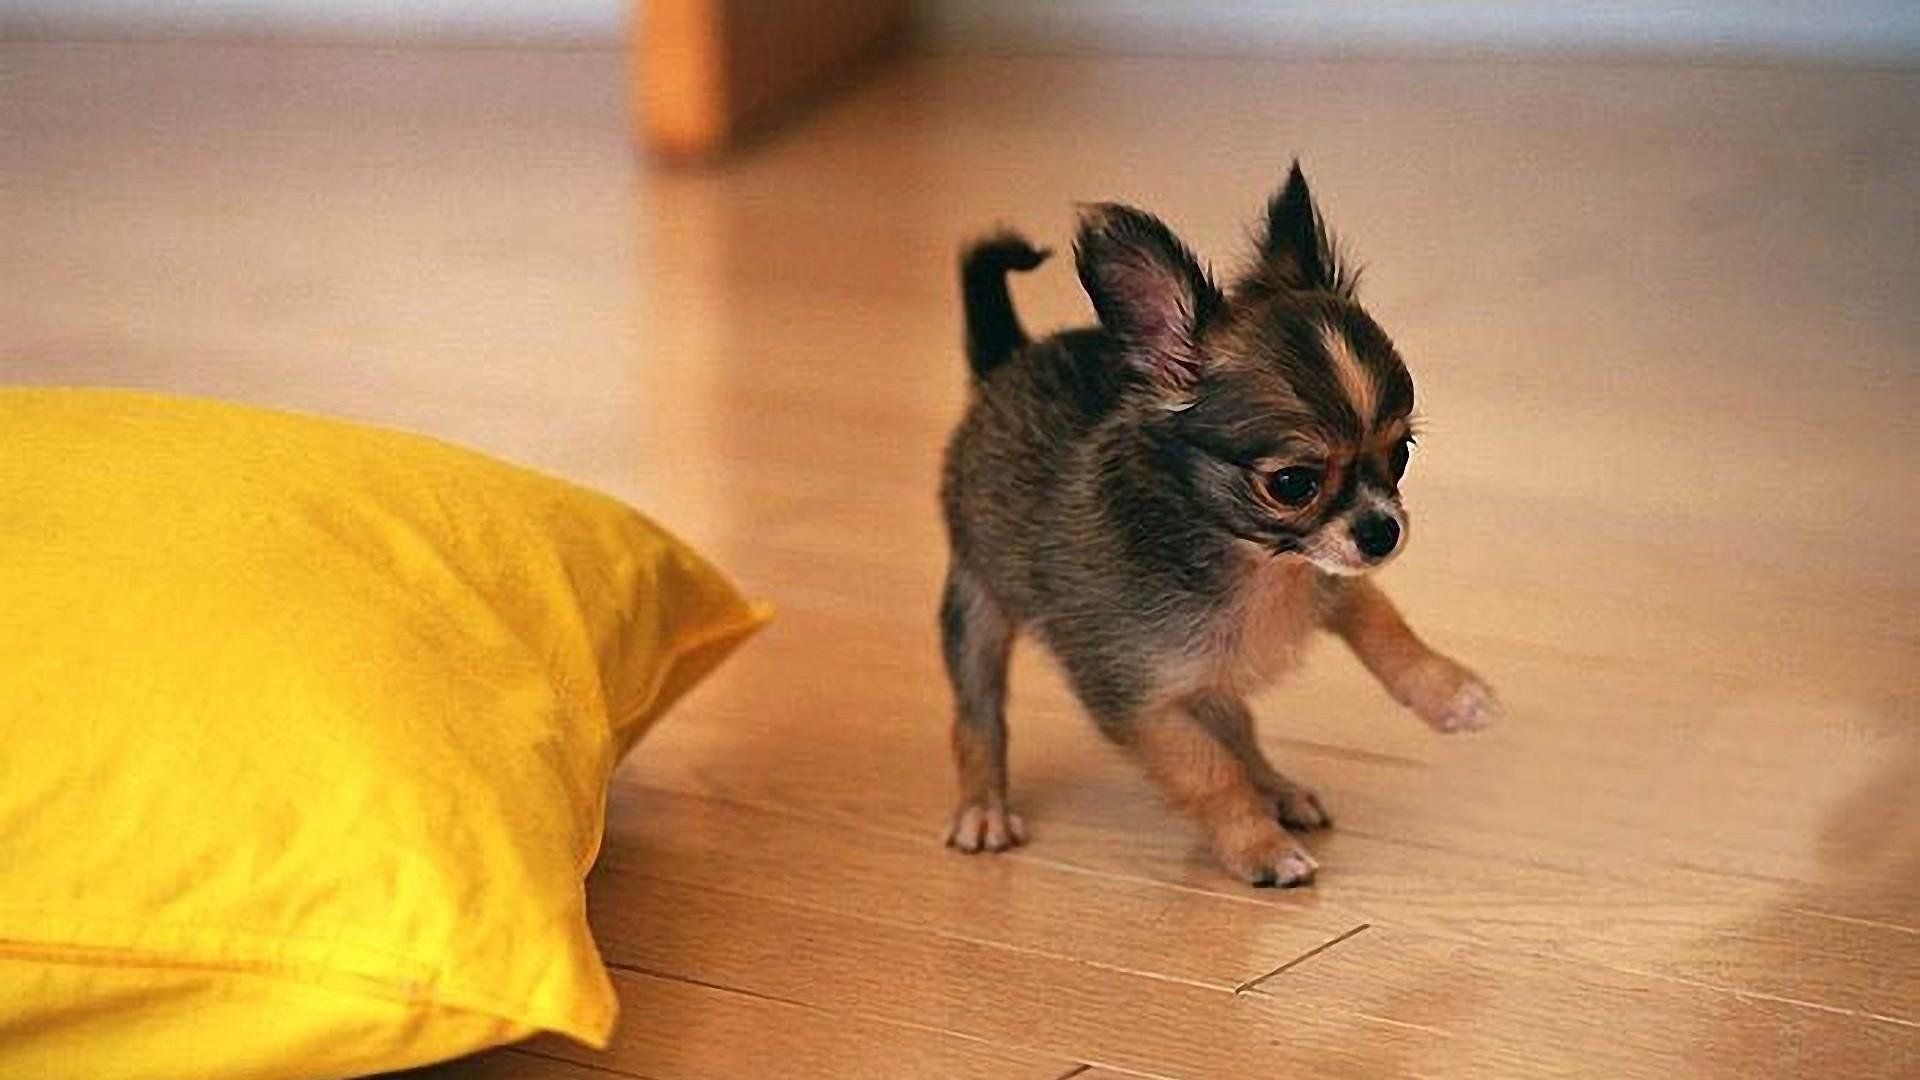 Cute Chihuahua Puppy Playing